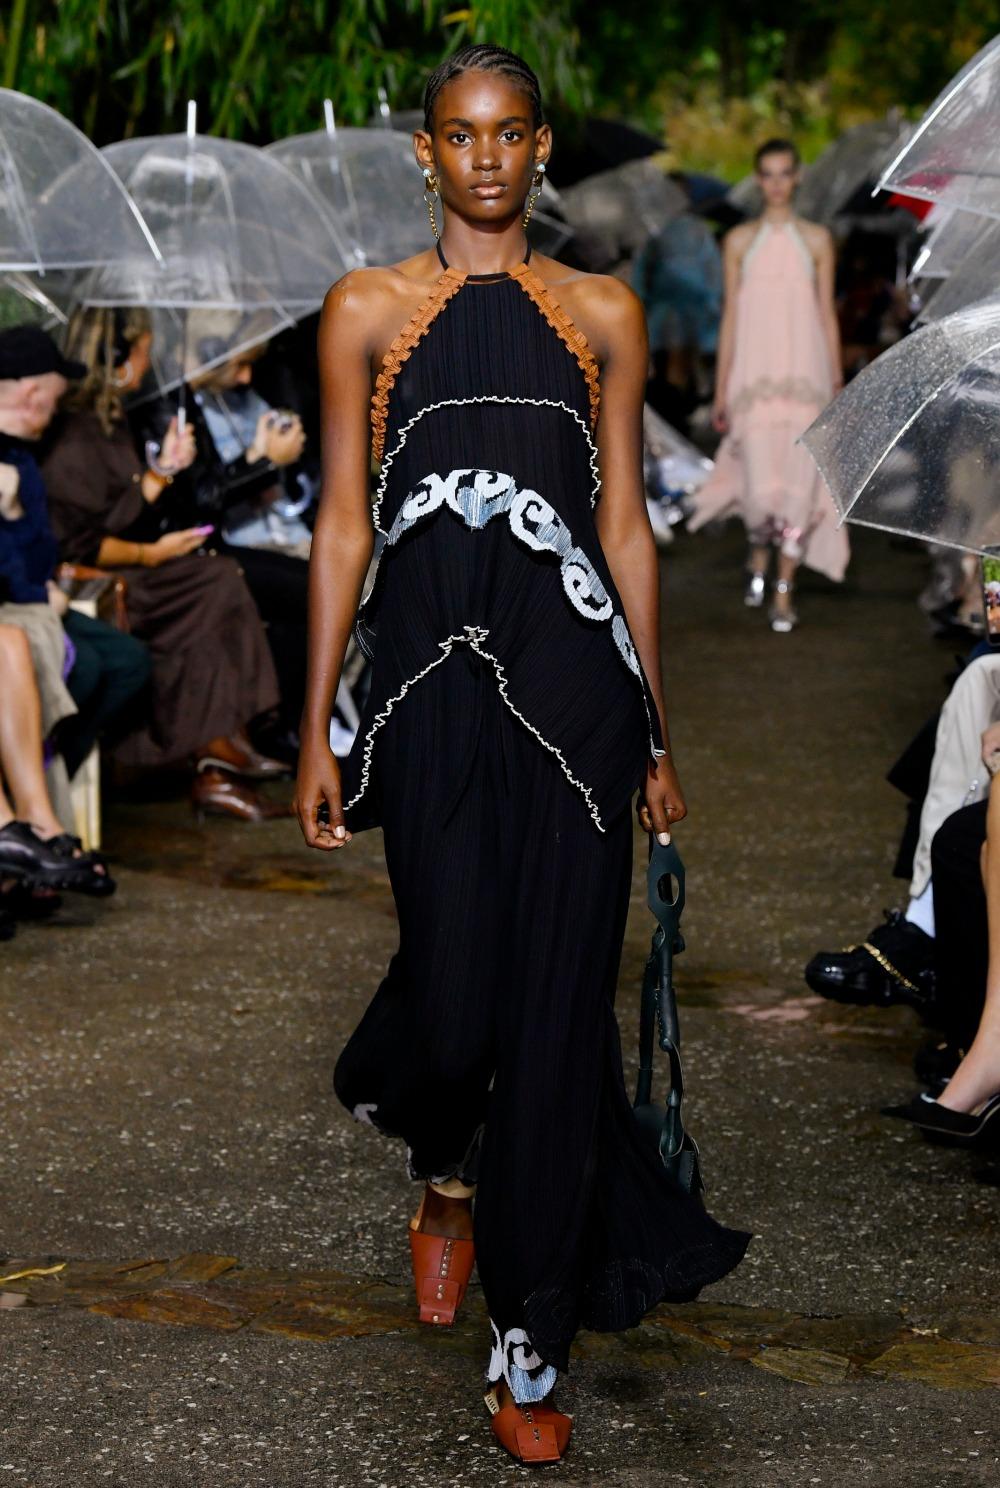 Lanvin Spring 2020 Collection Runway at Paris Fashion Week I DreaminLacde.com #designerfashion #fashionweek #highfashion #Lanvin